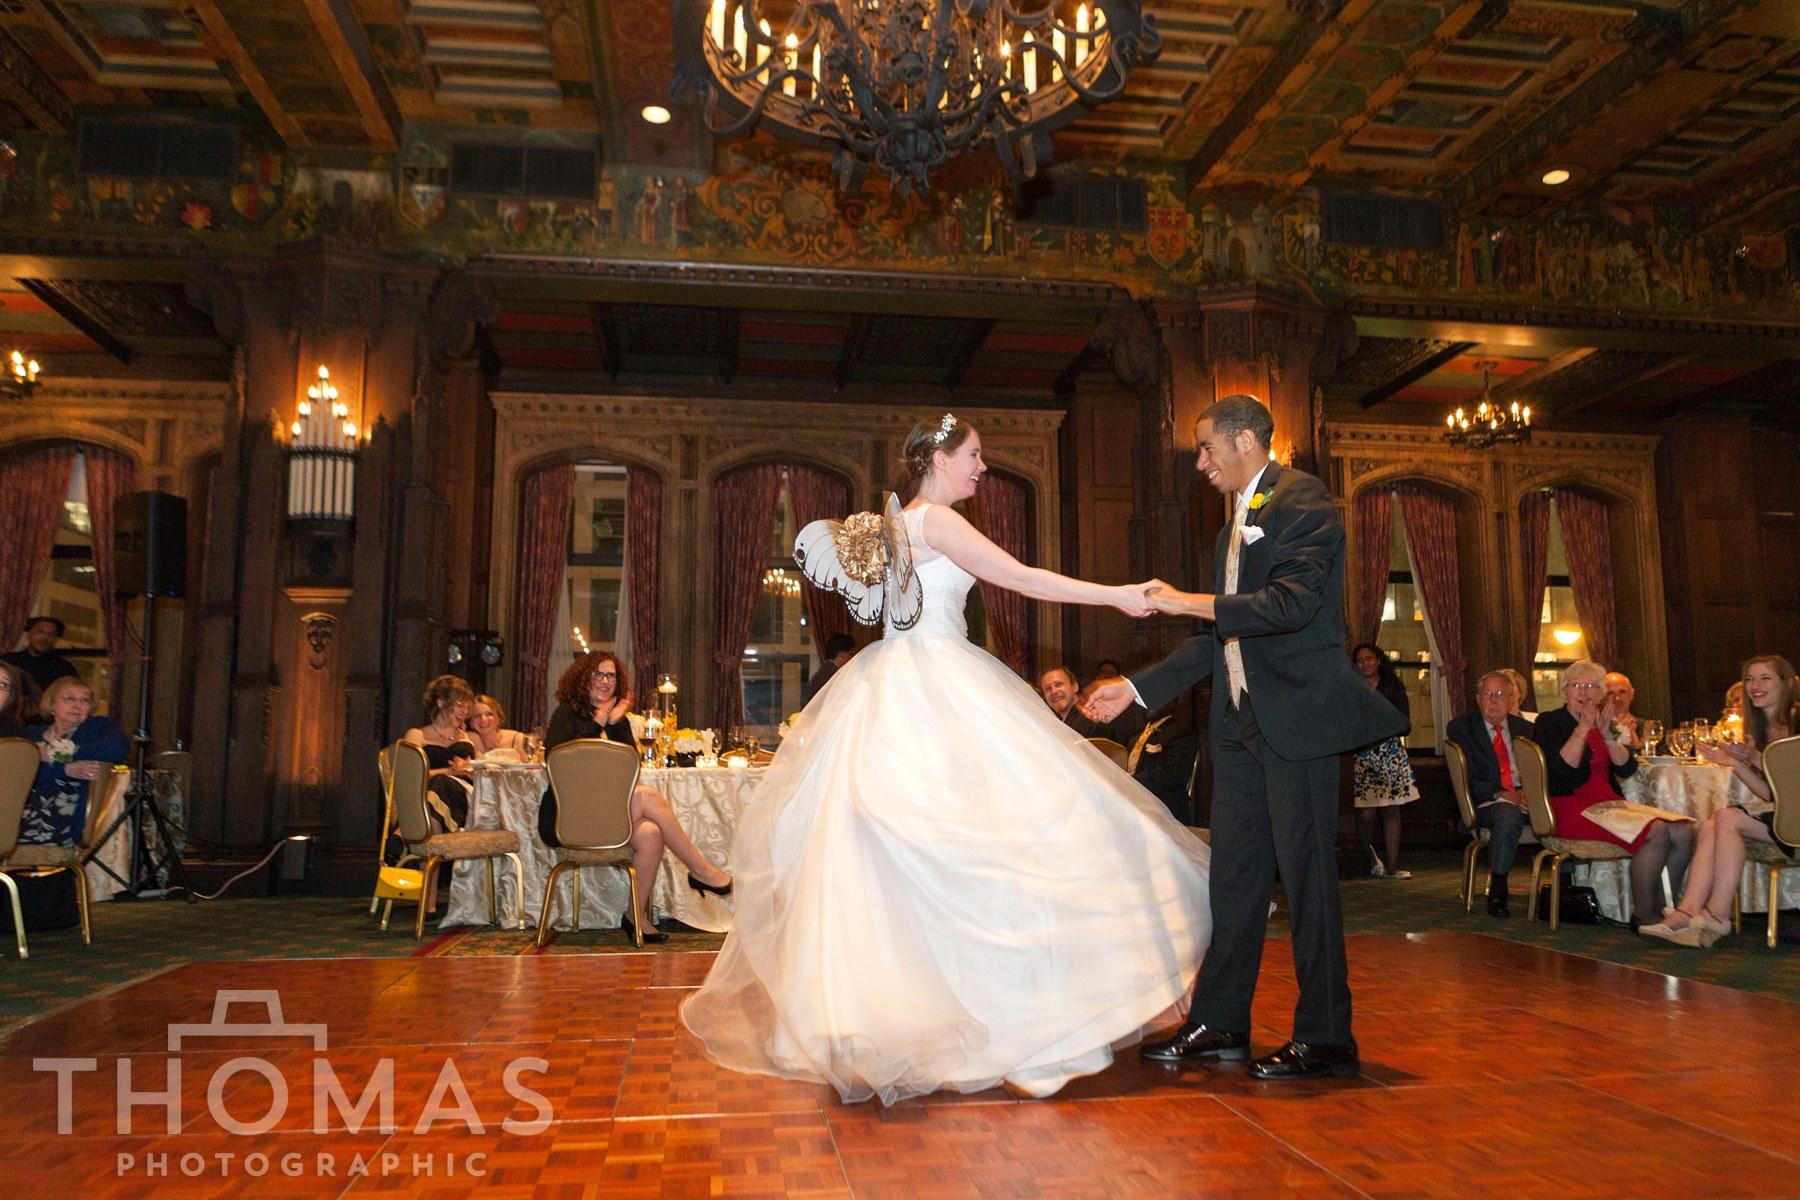 thomas-photography-fairy-wedding